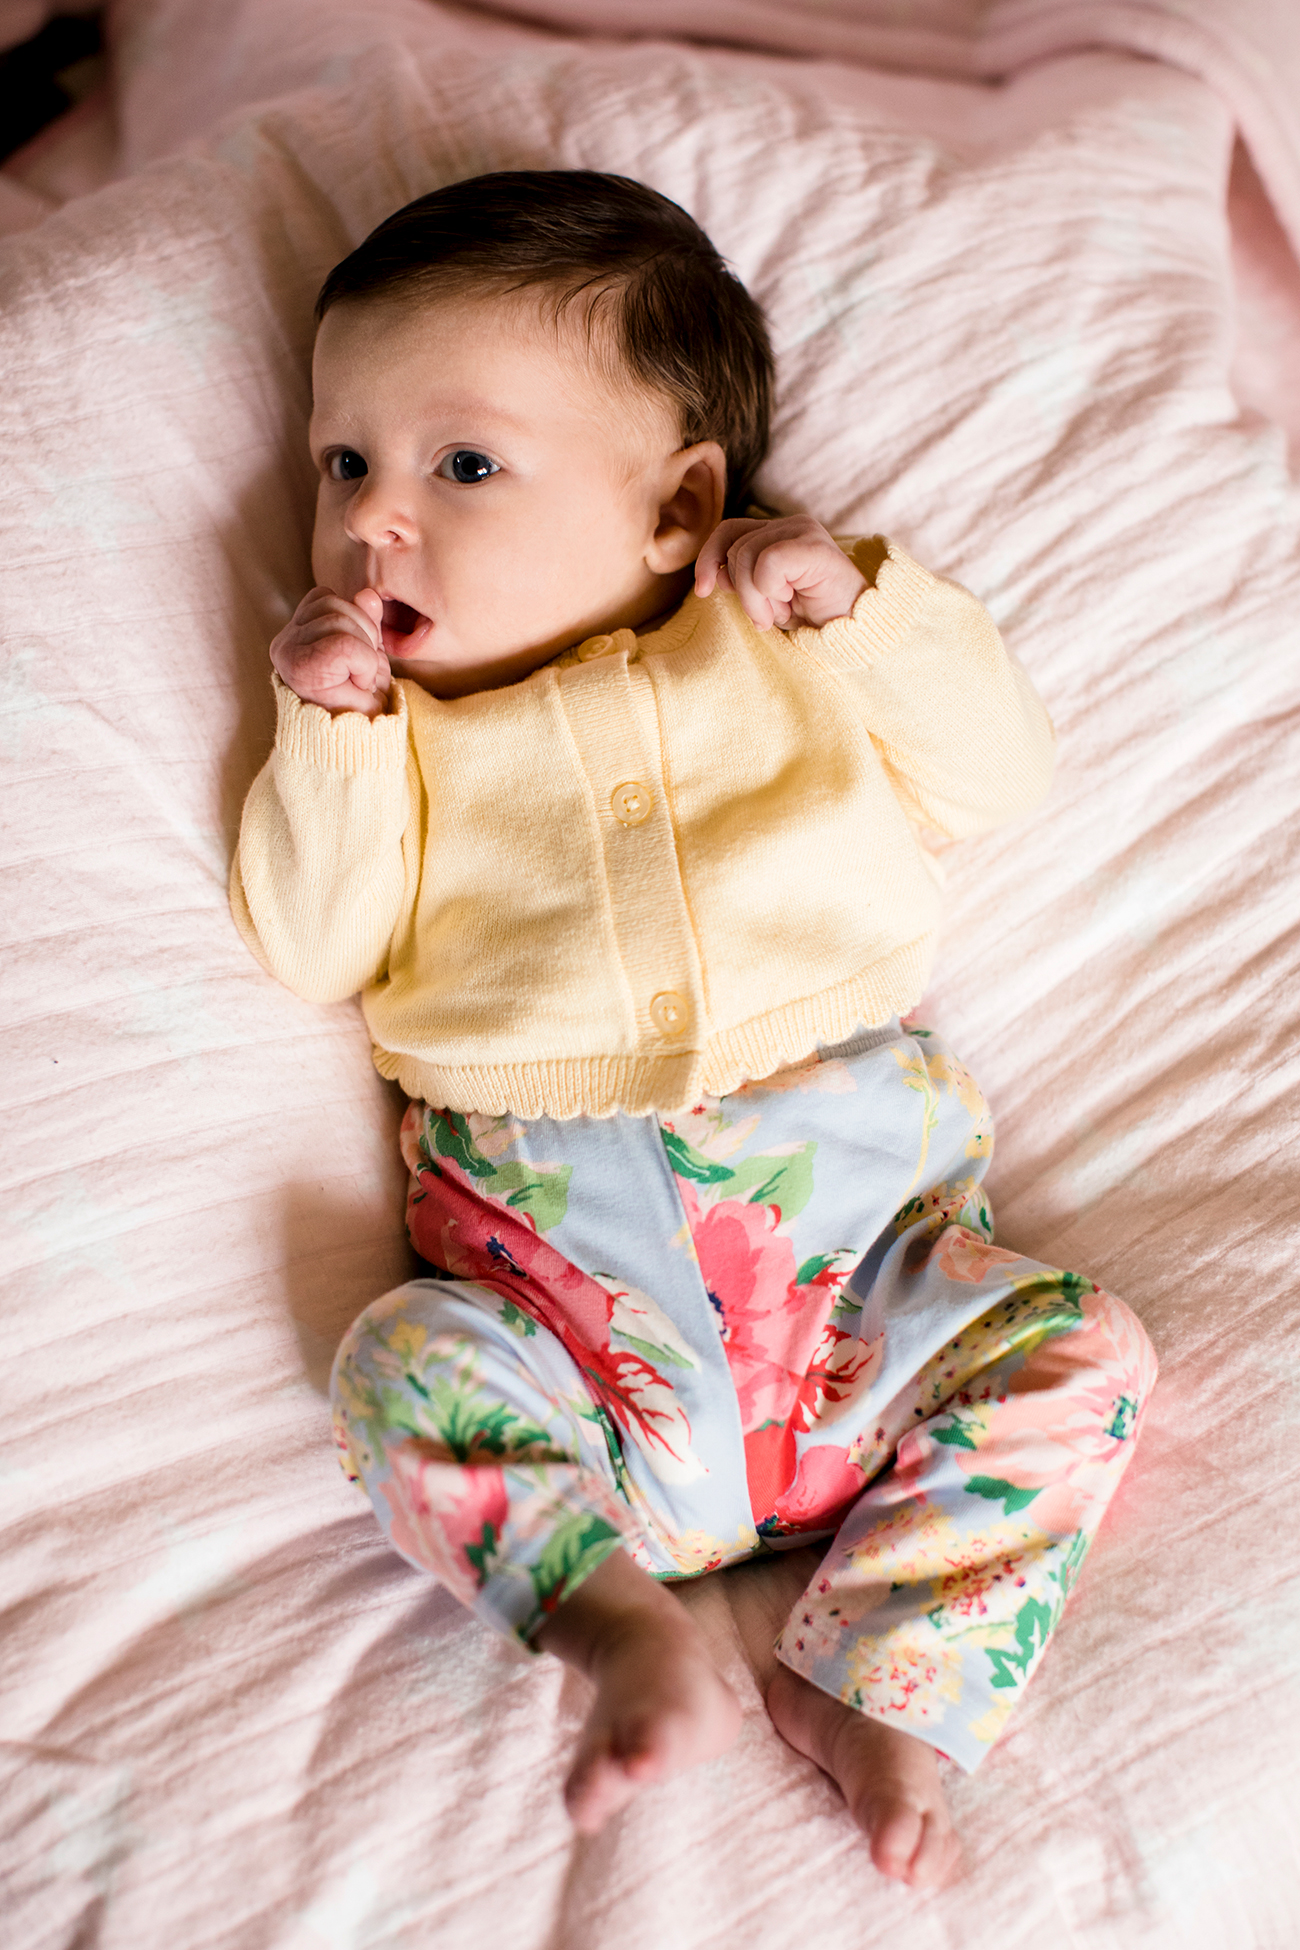 Baby girl ellies newborn shoot image property of www j dphoto com